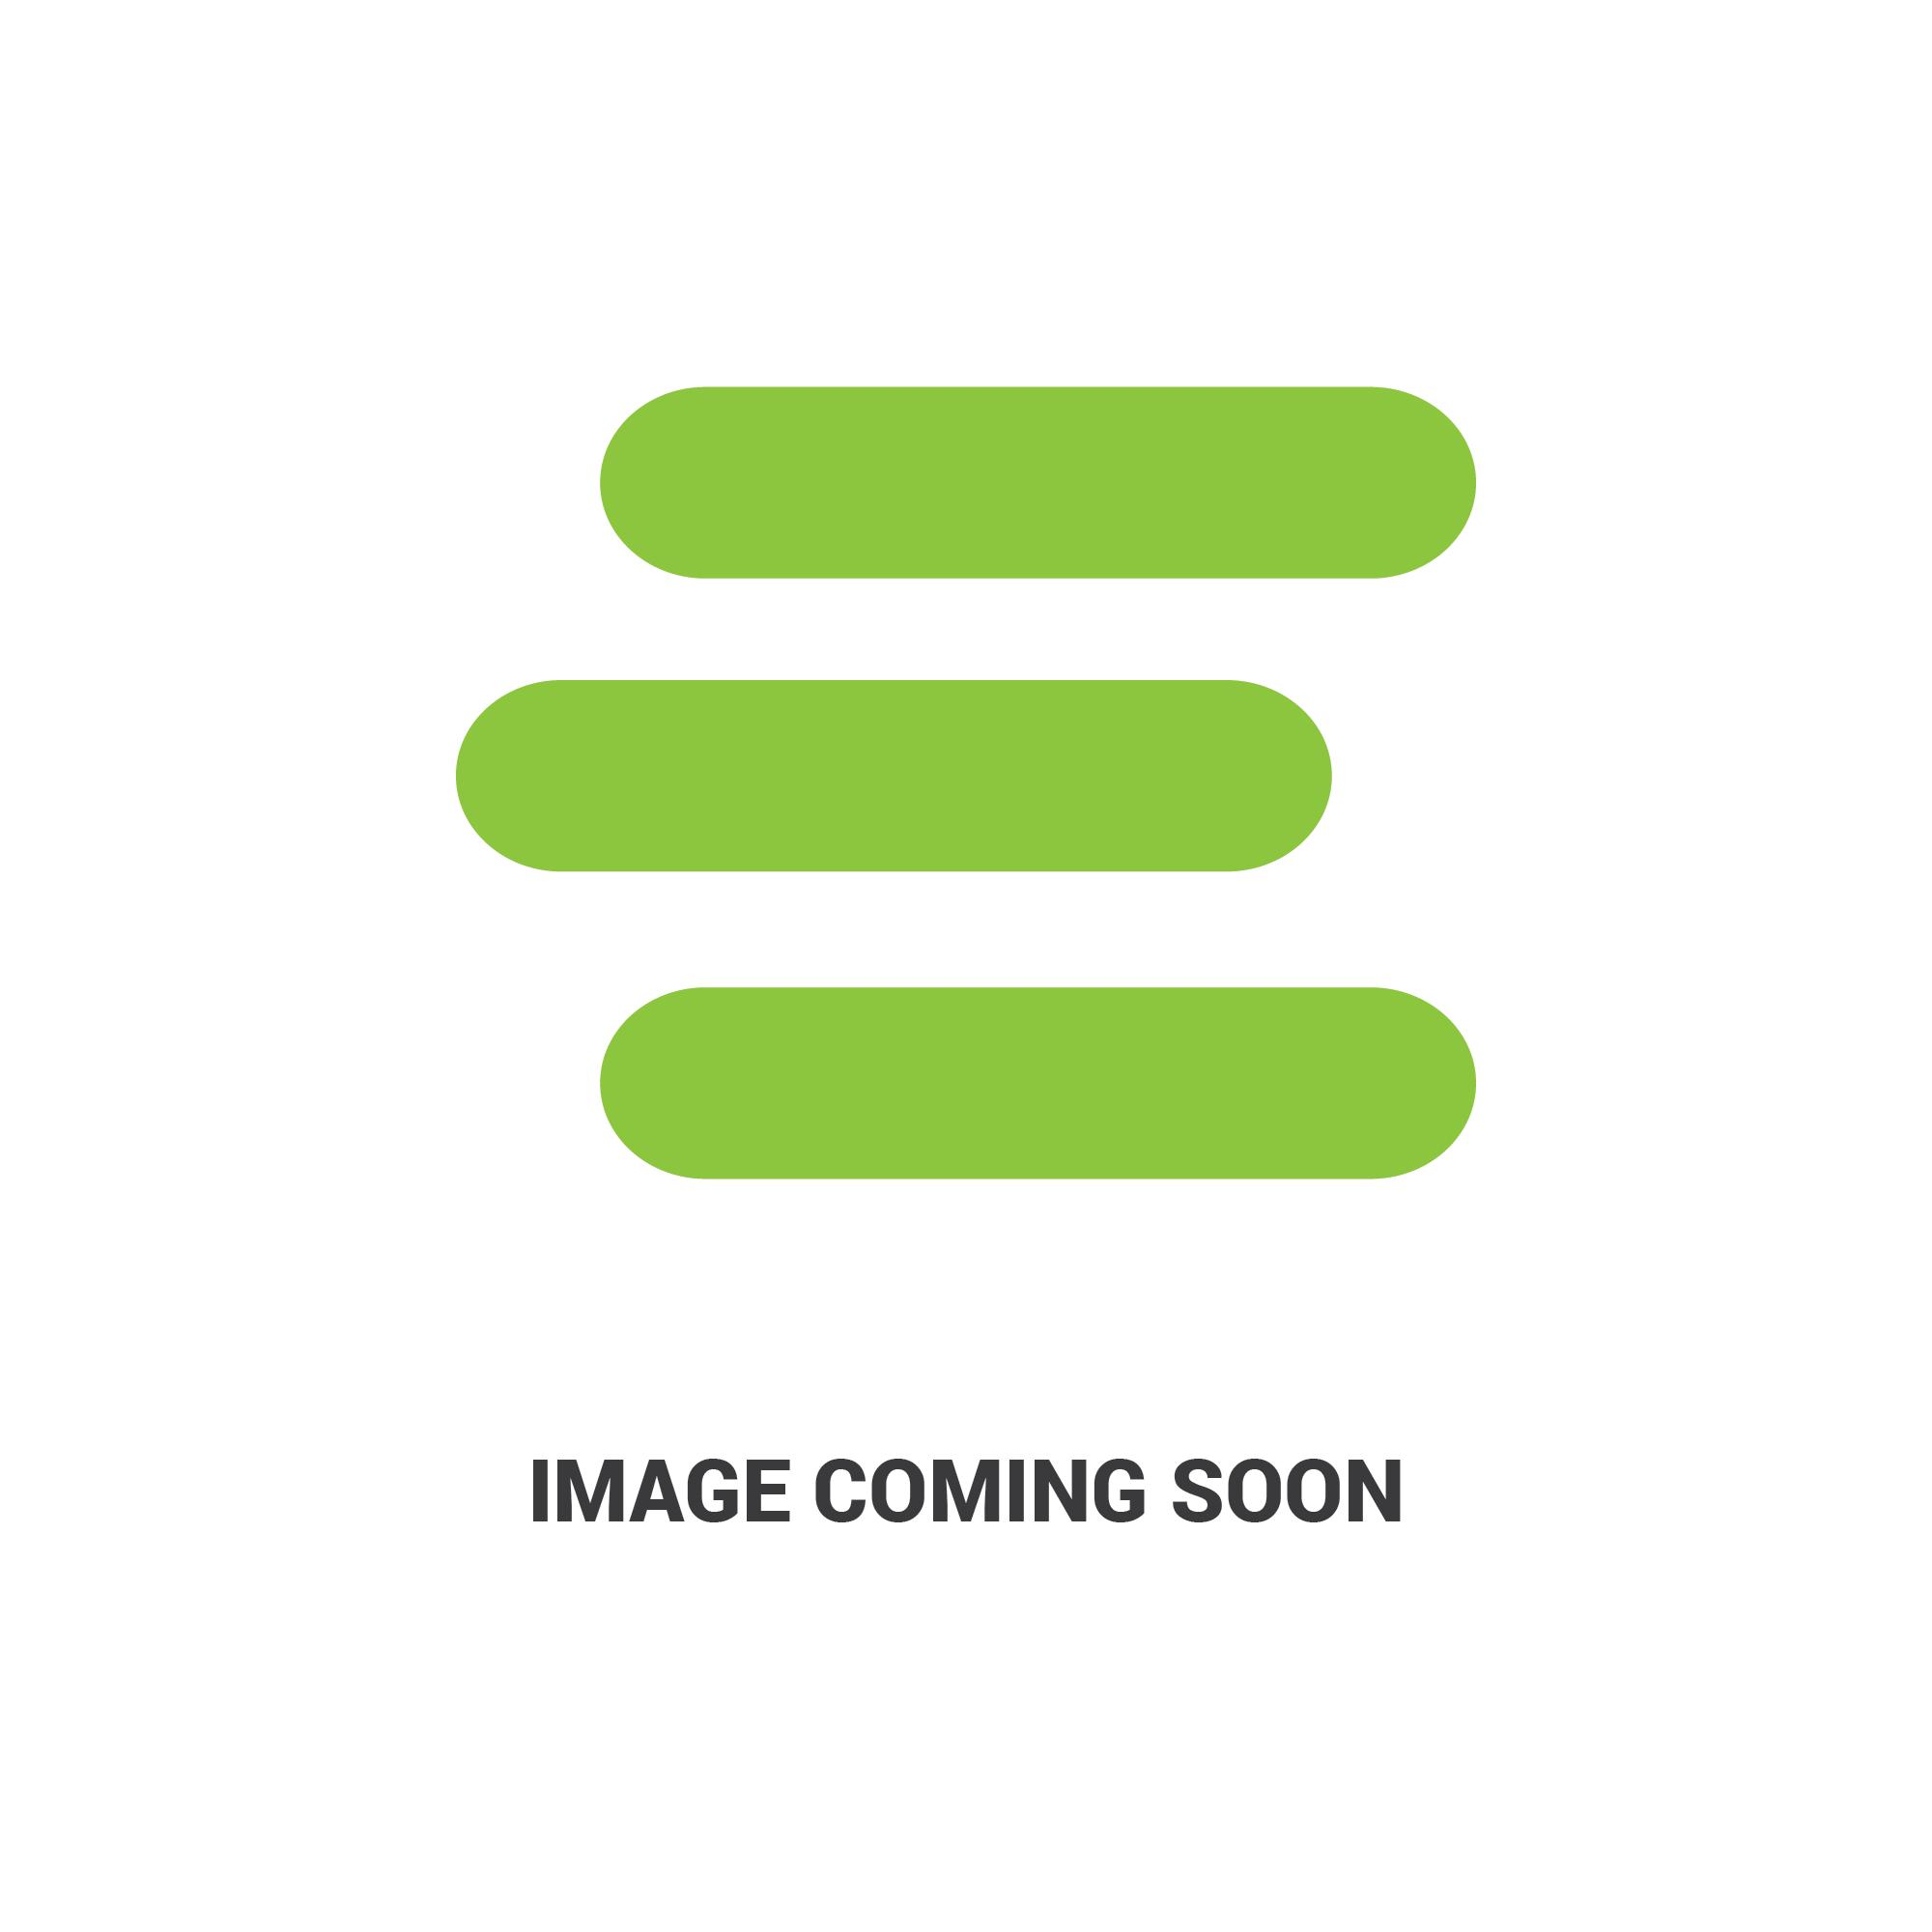 E-16030-51053edit 3.jpg